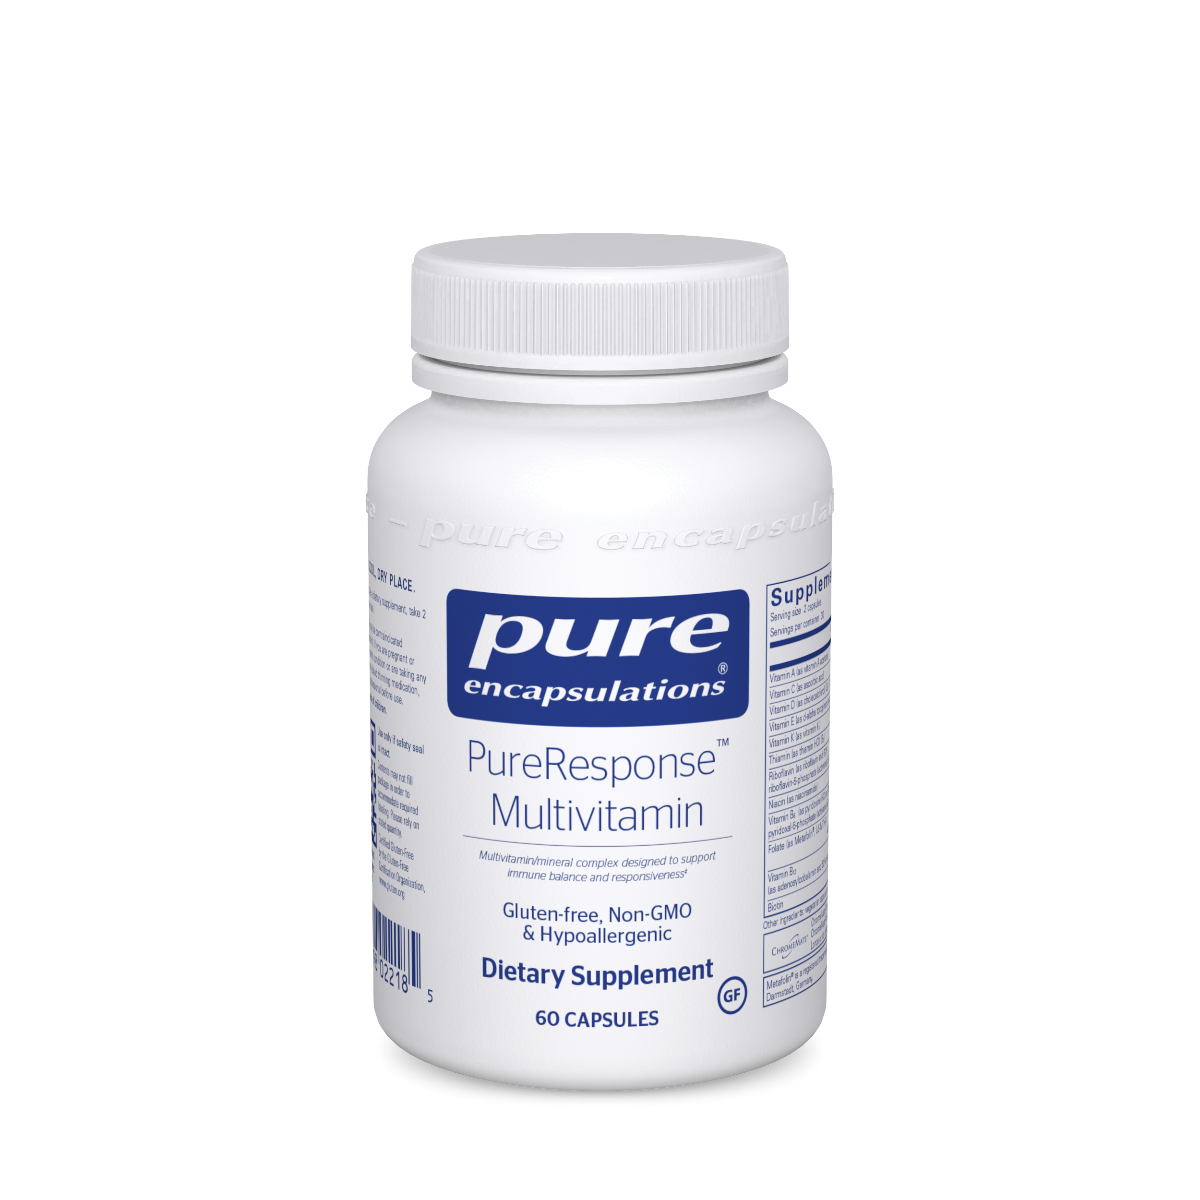 Pure Response Multivitamin